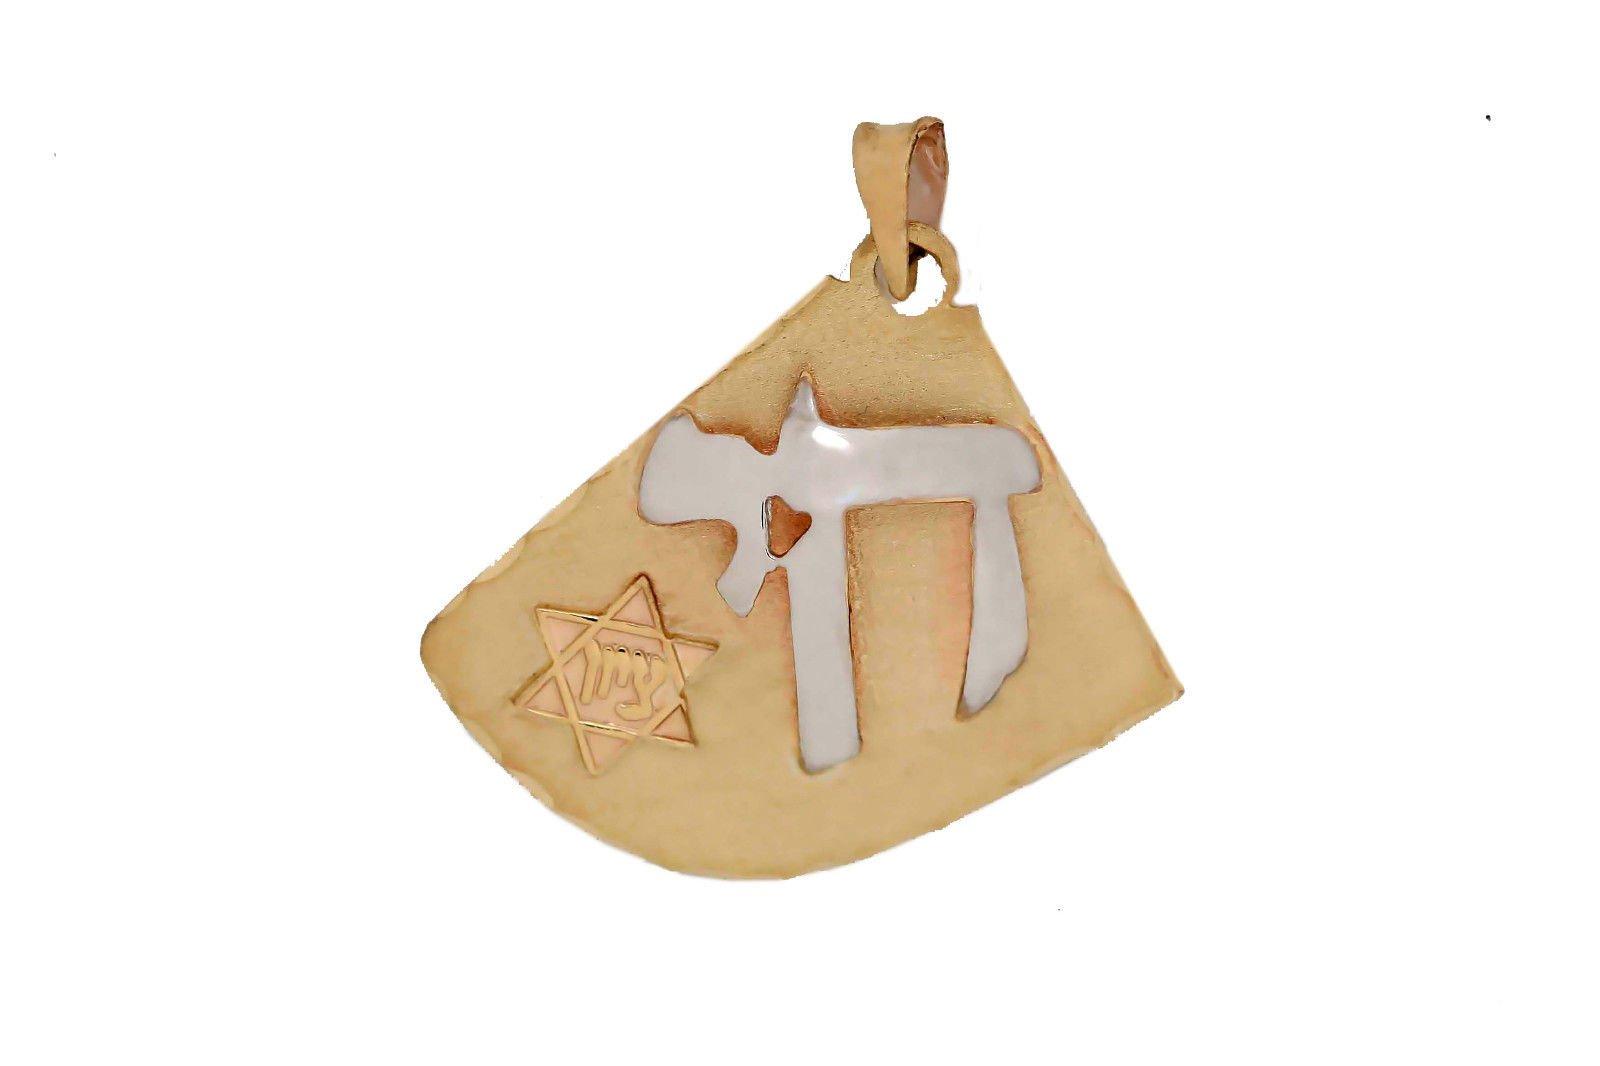 Jewish Jewelry 14K Gold ''Chai'' & Star Of David Pendant 25mm X 25mm, 2.2 grams. Great Gift For: Bar Mitzvah Bat Mitzvah Rosh Hashanah Chanukah Wedding Shabbat Seder Night Passover Purim and Other Jewish Holiday by Judaica